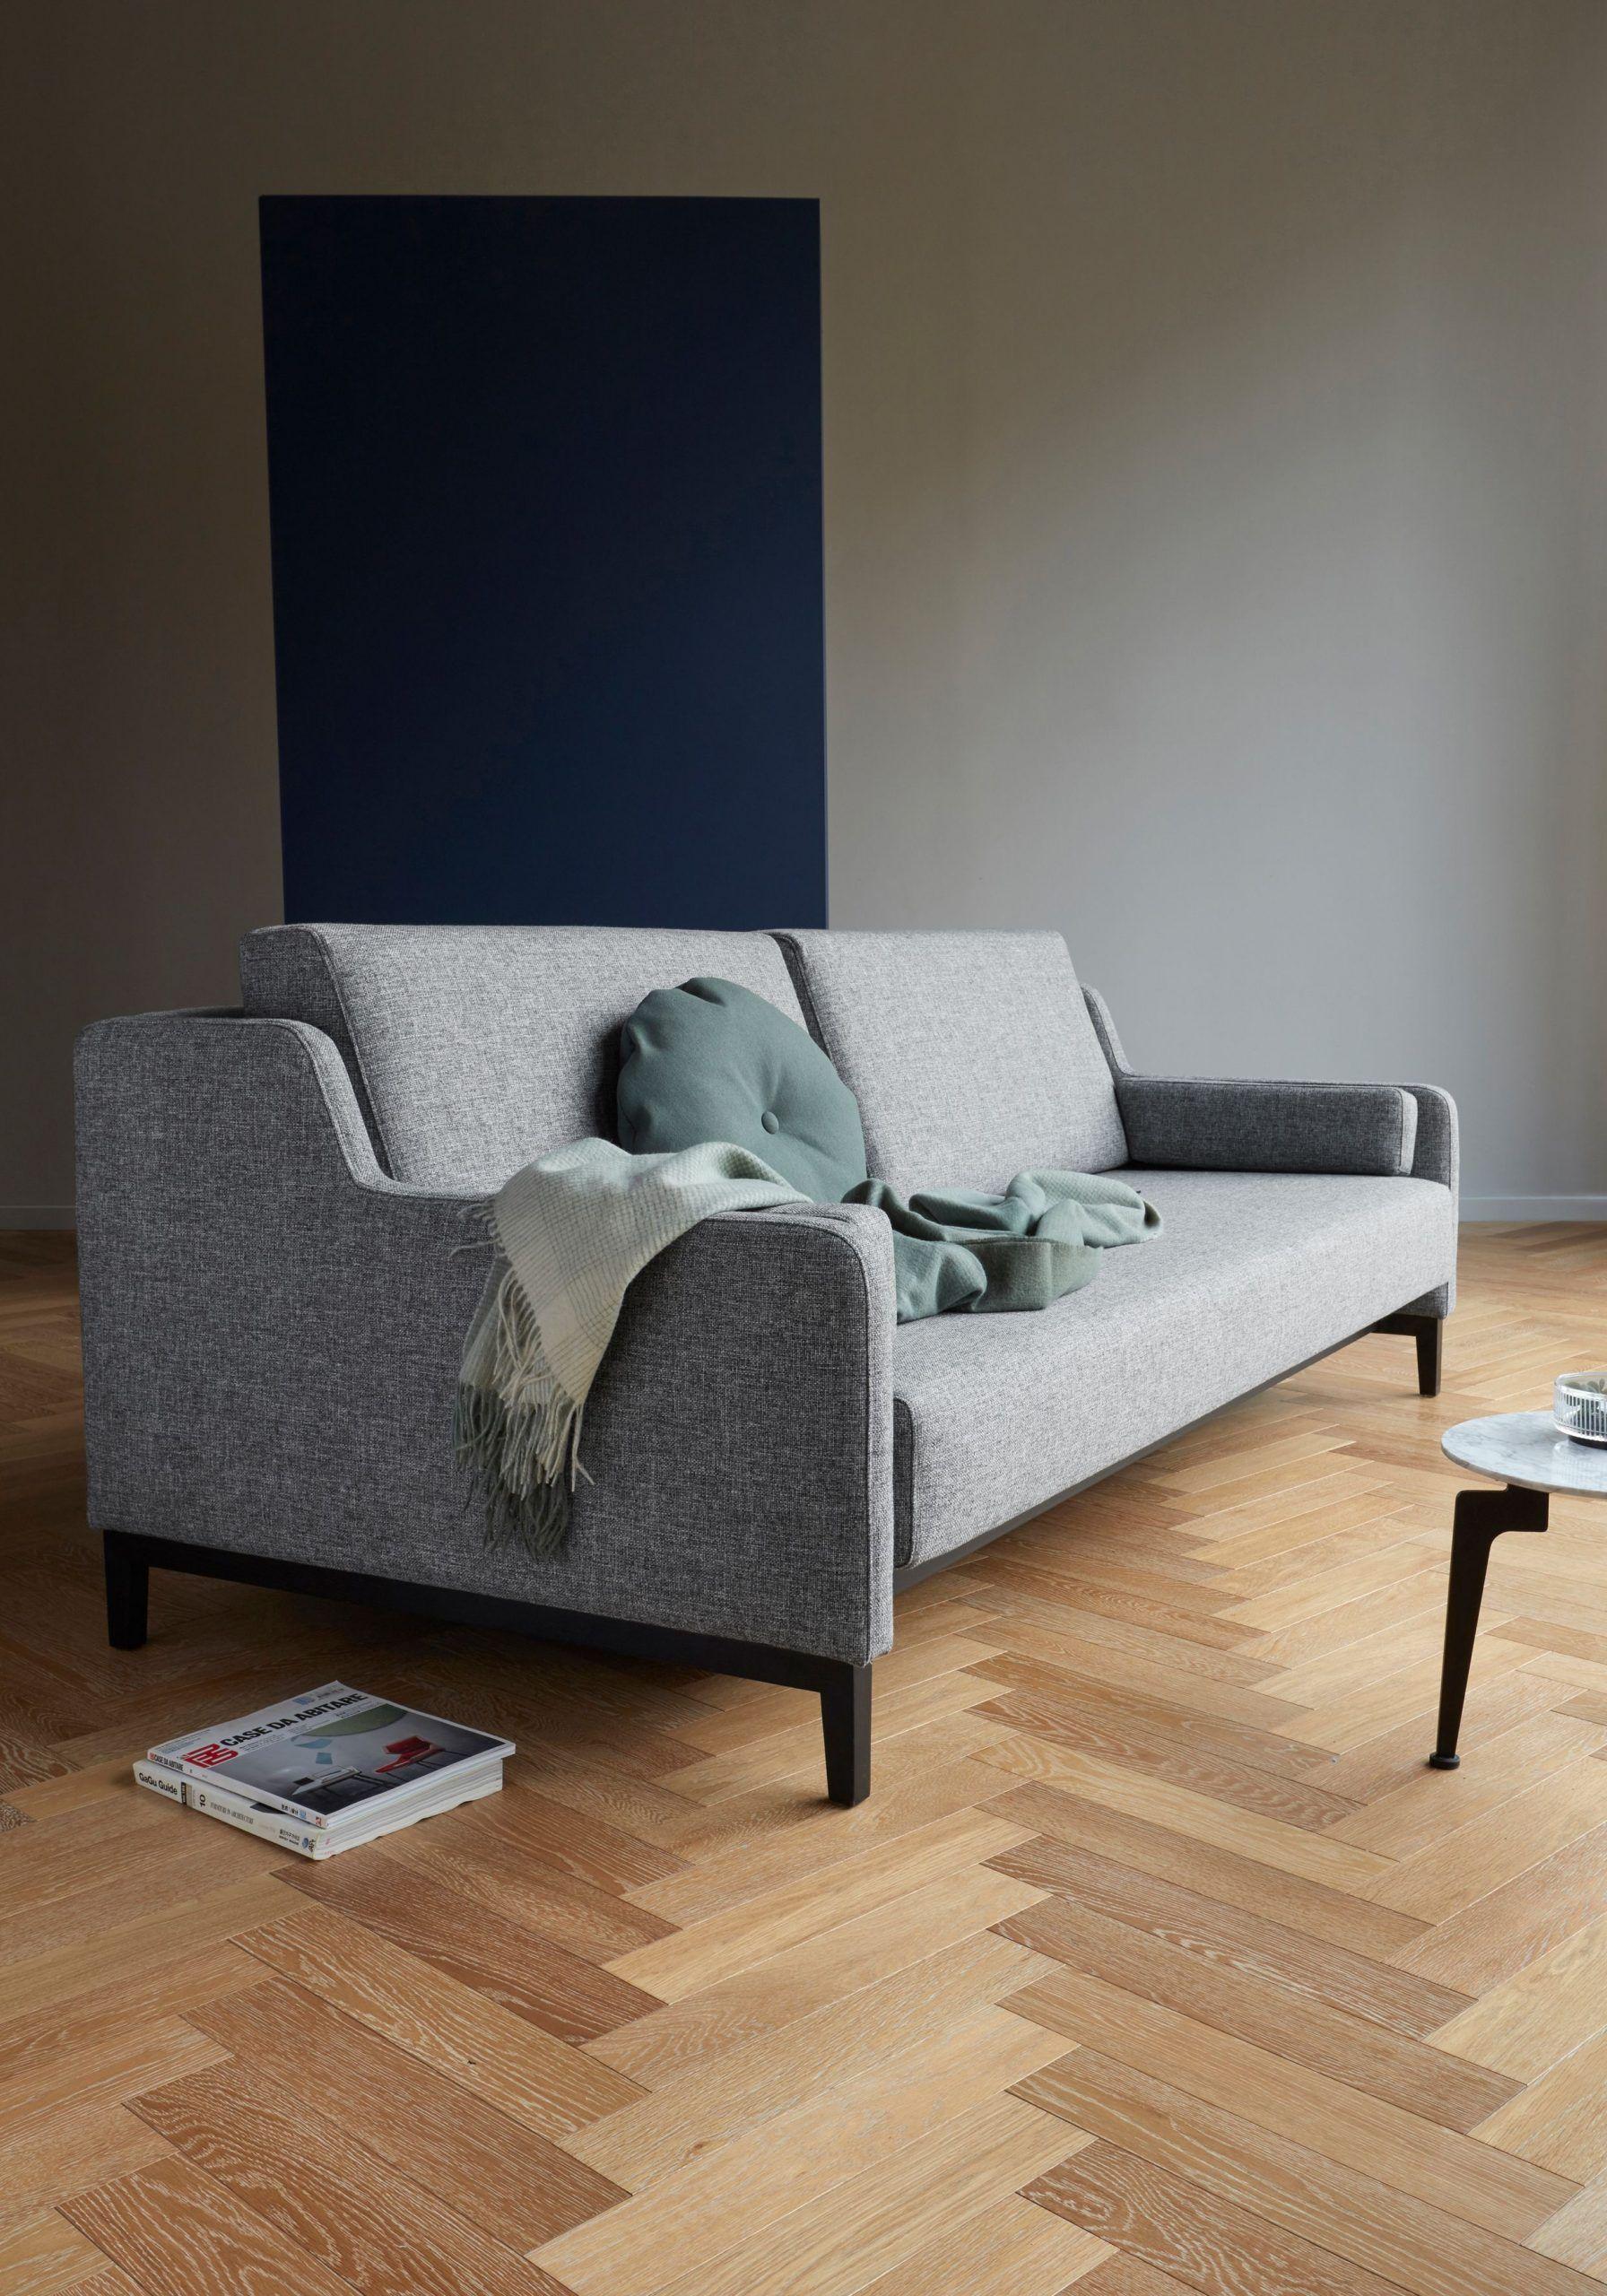 Hermod 160 X 200 Cm Schlafsofa Scandinavian Design In 2020